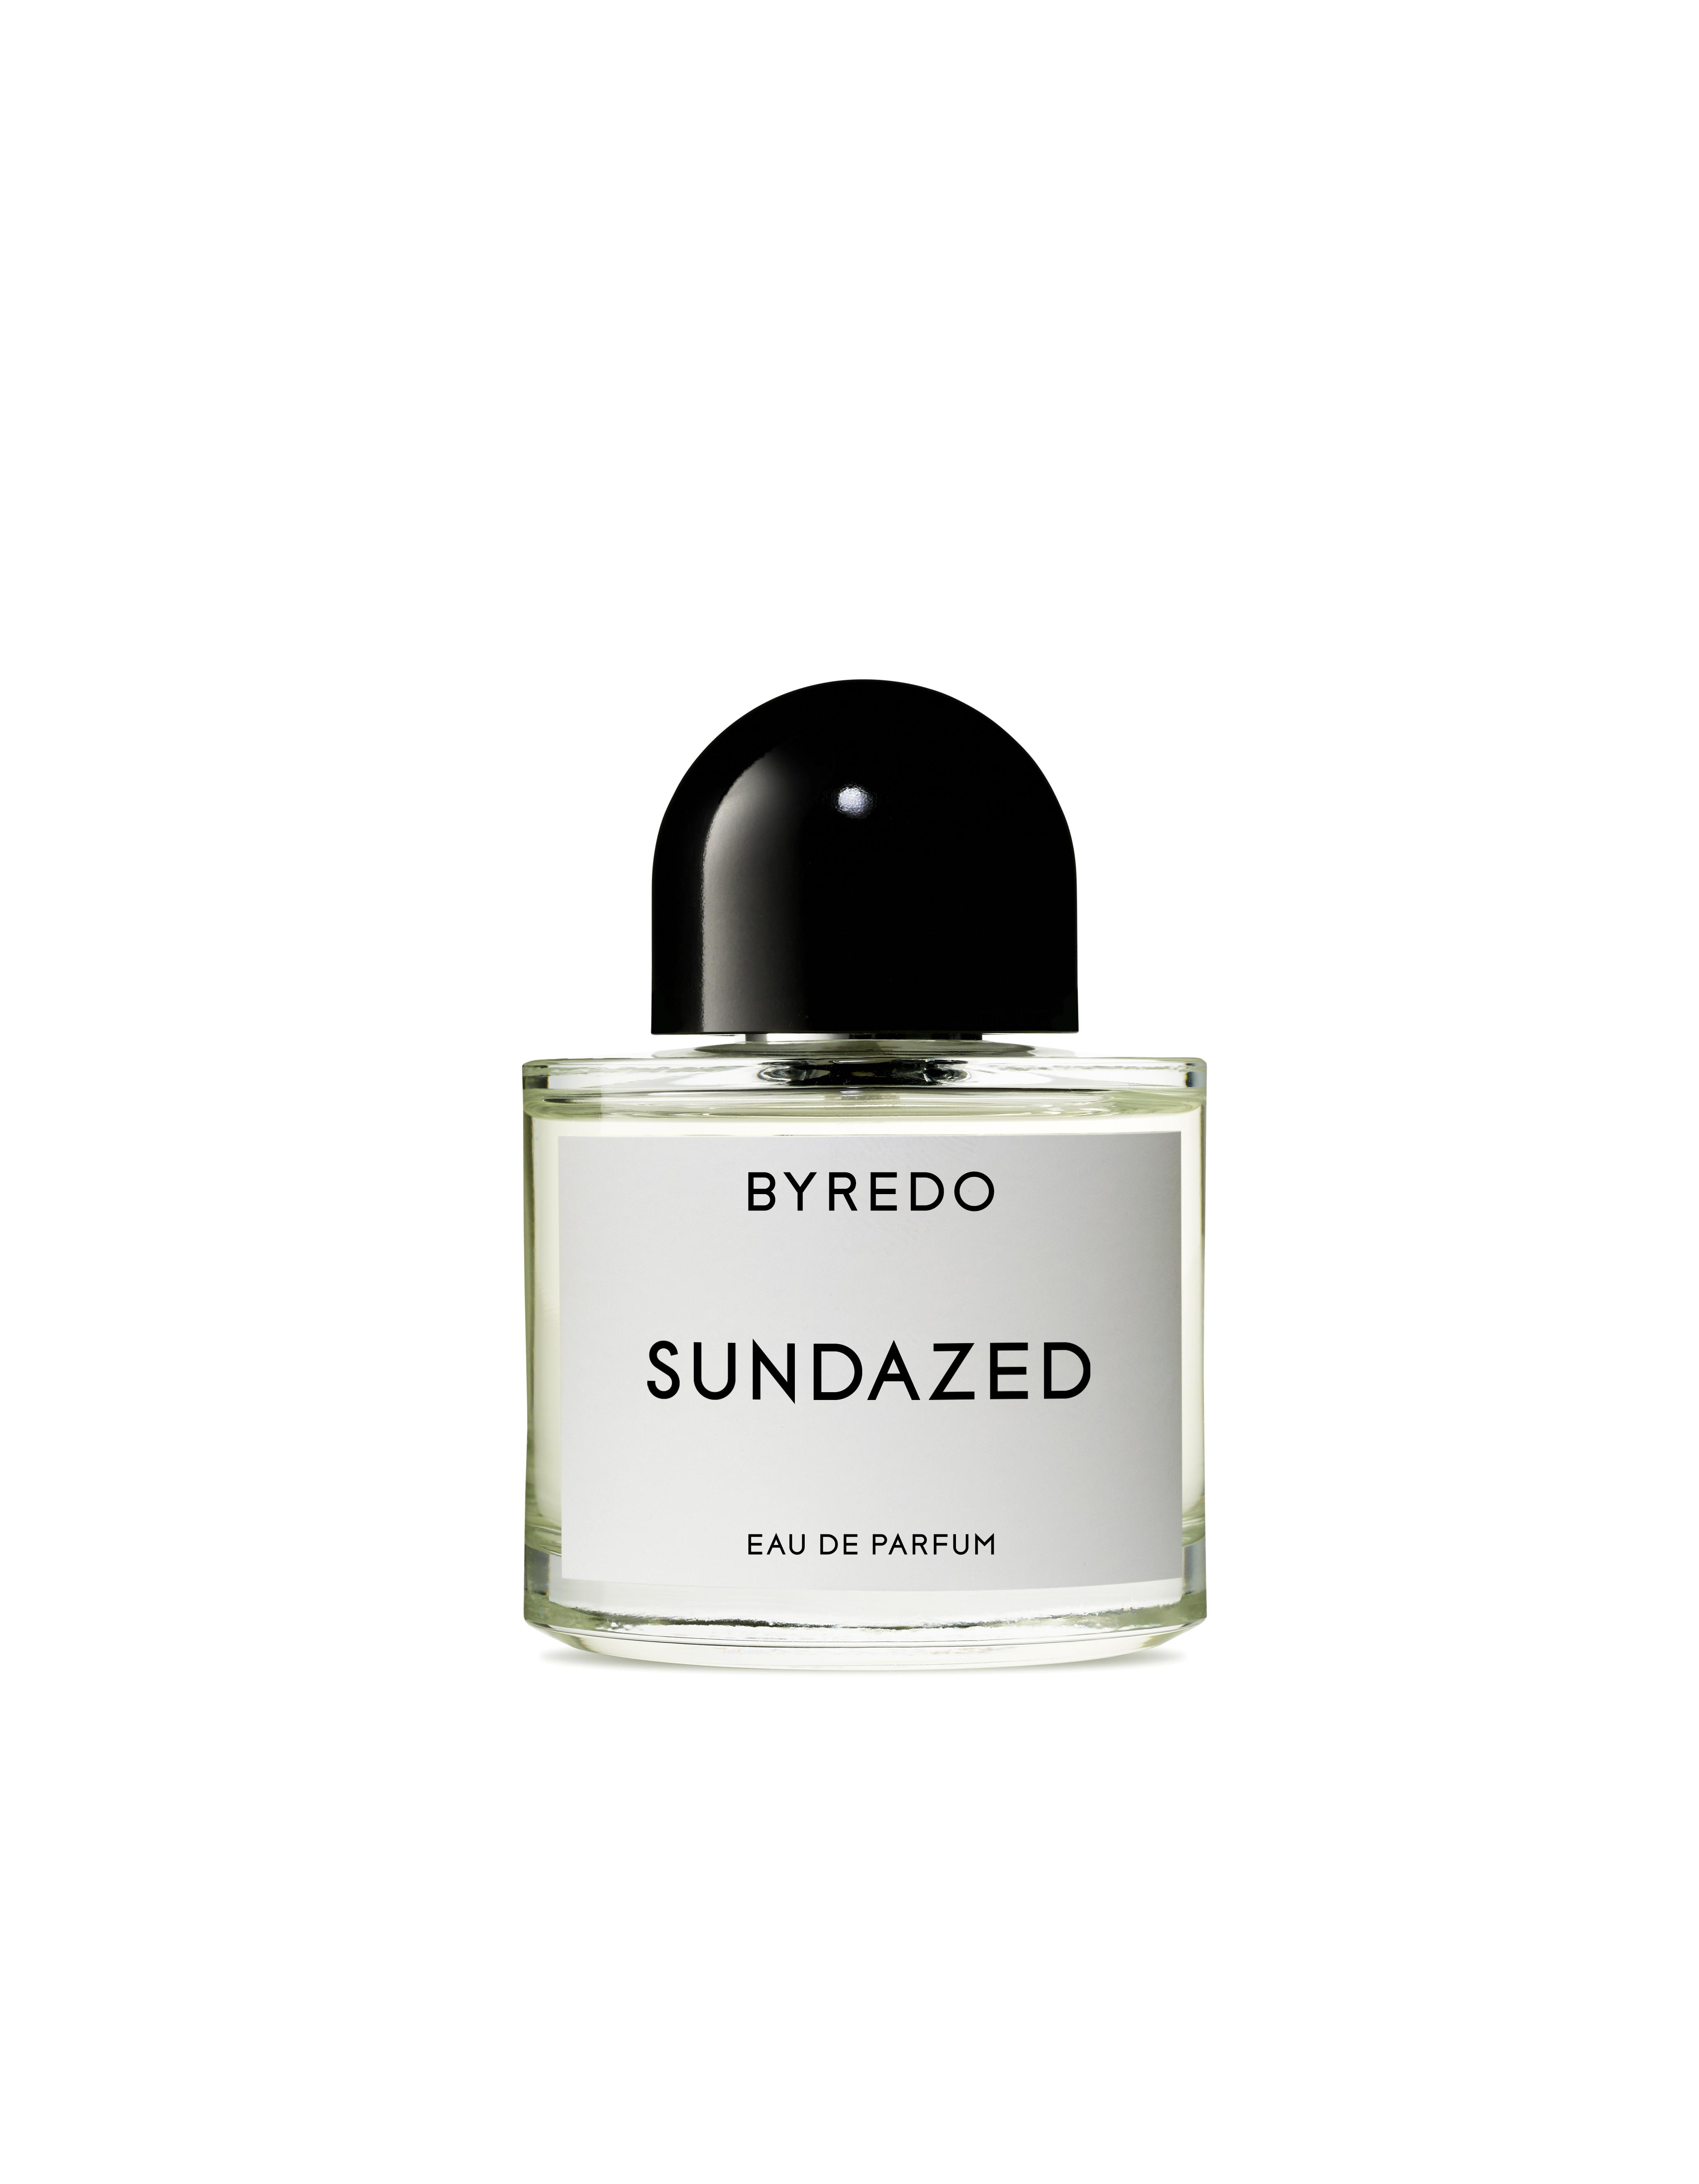 Byredo Sundazed Perfume